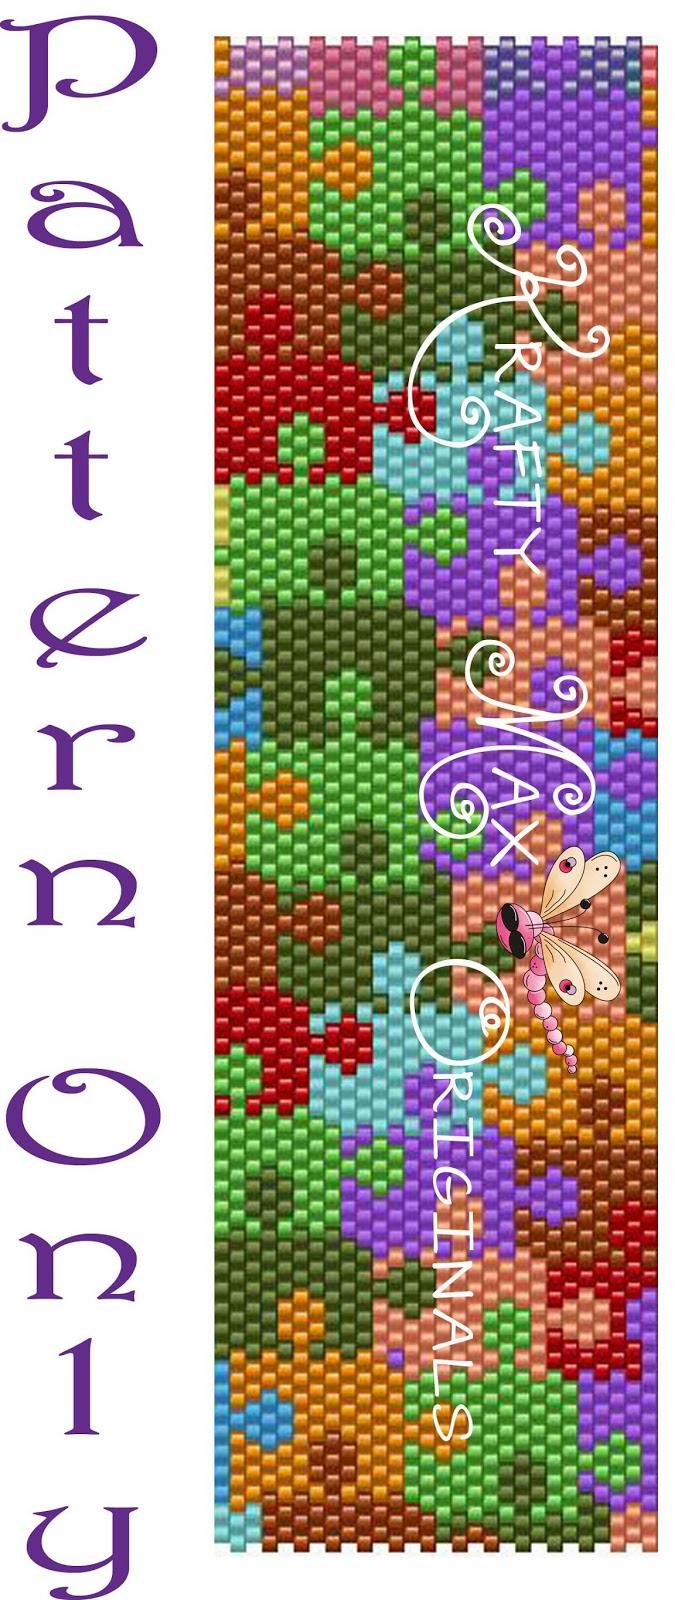 http://www.artfire.com/ext/shop/product_view/KraftyMax/8228863/puzzle_pieces_peyote_bracelet_retail_pattern_only/design/patterns/jewelry/bracelets